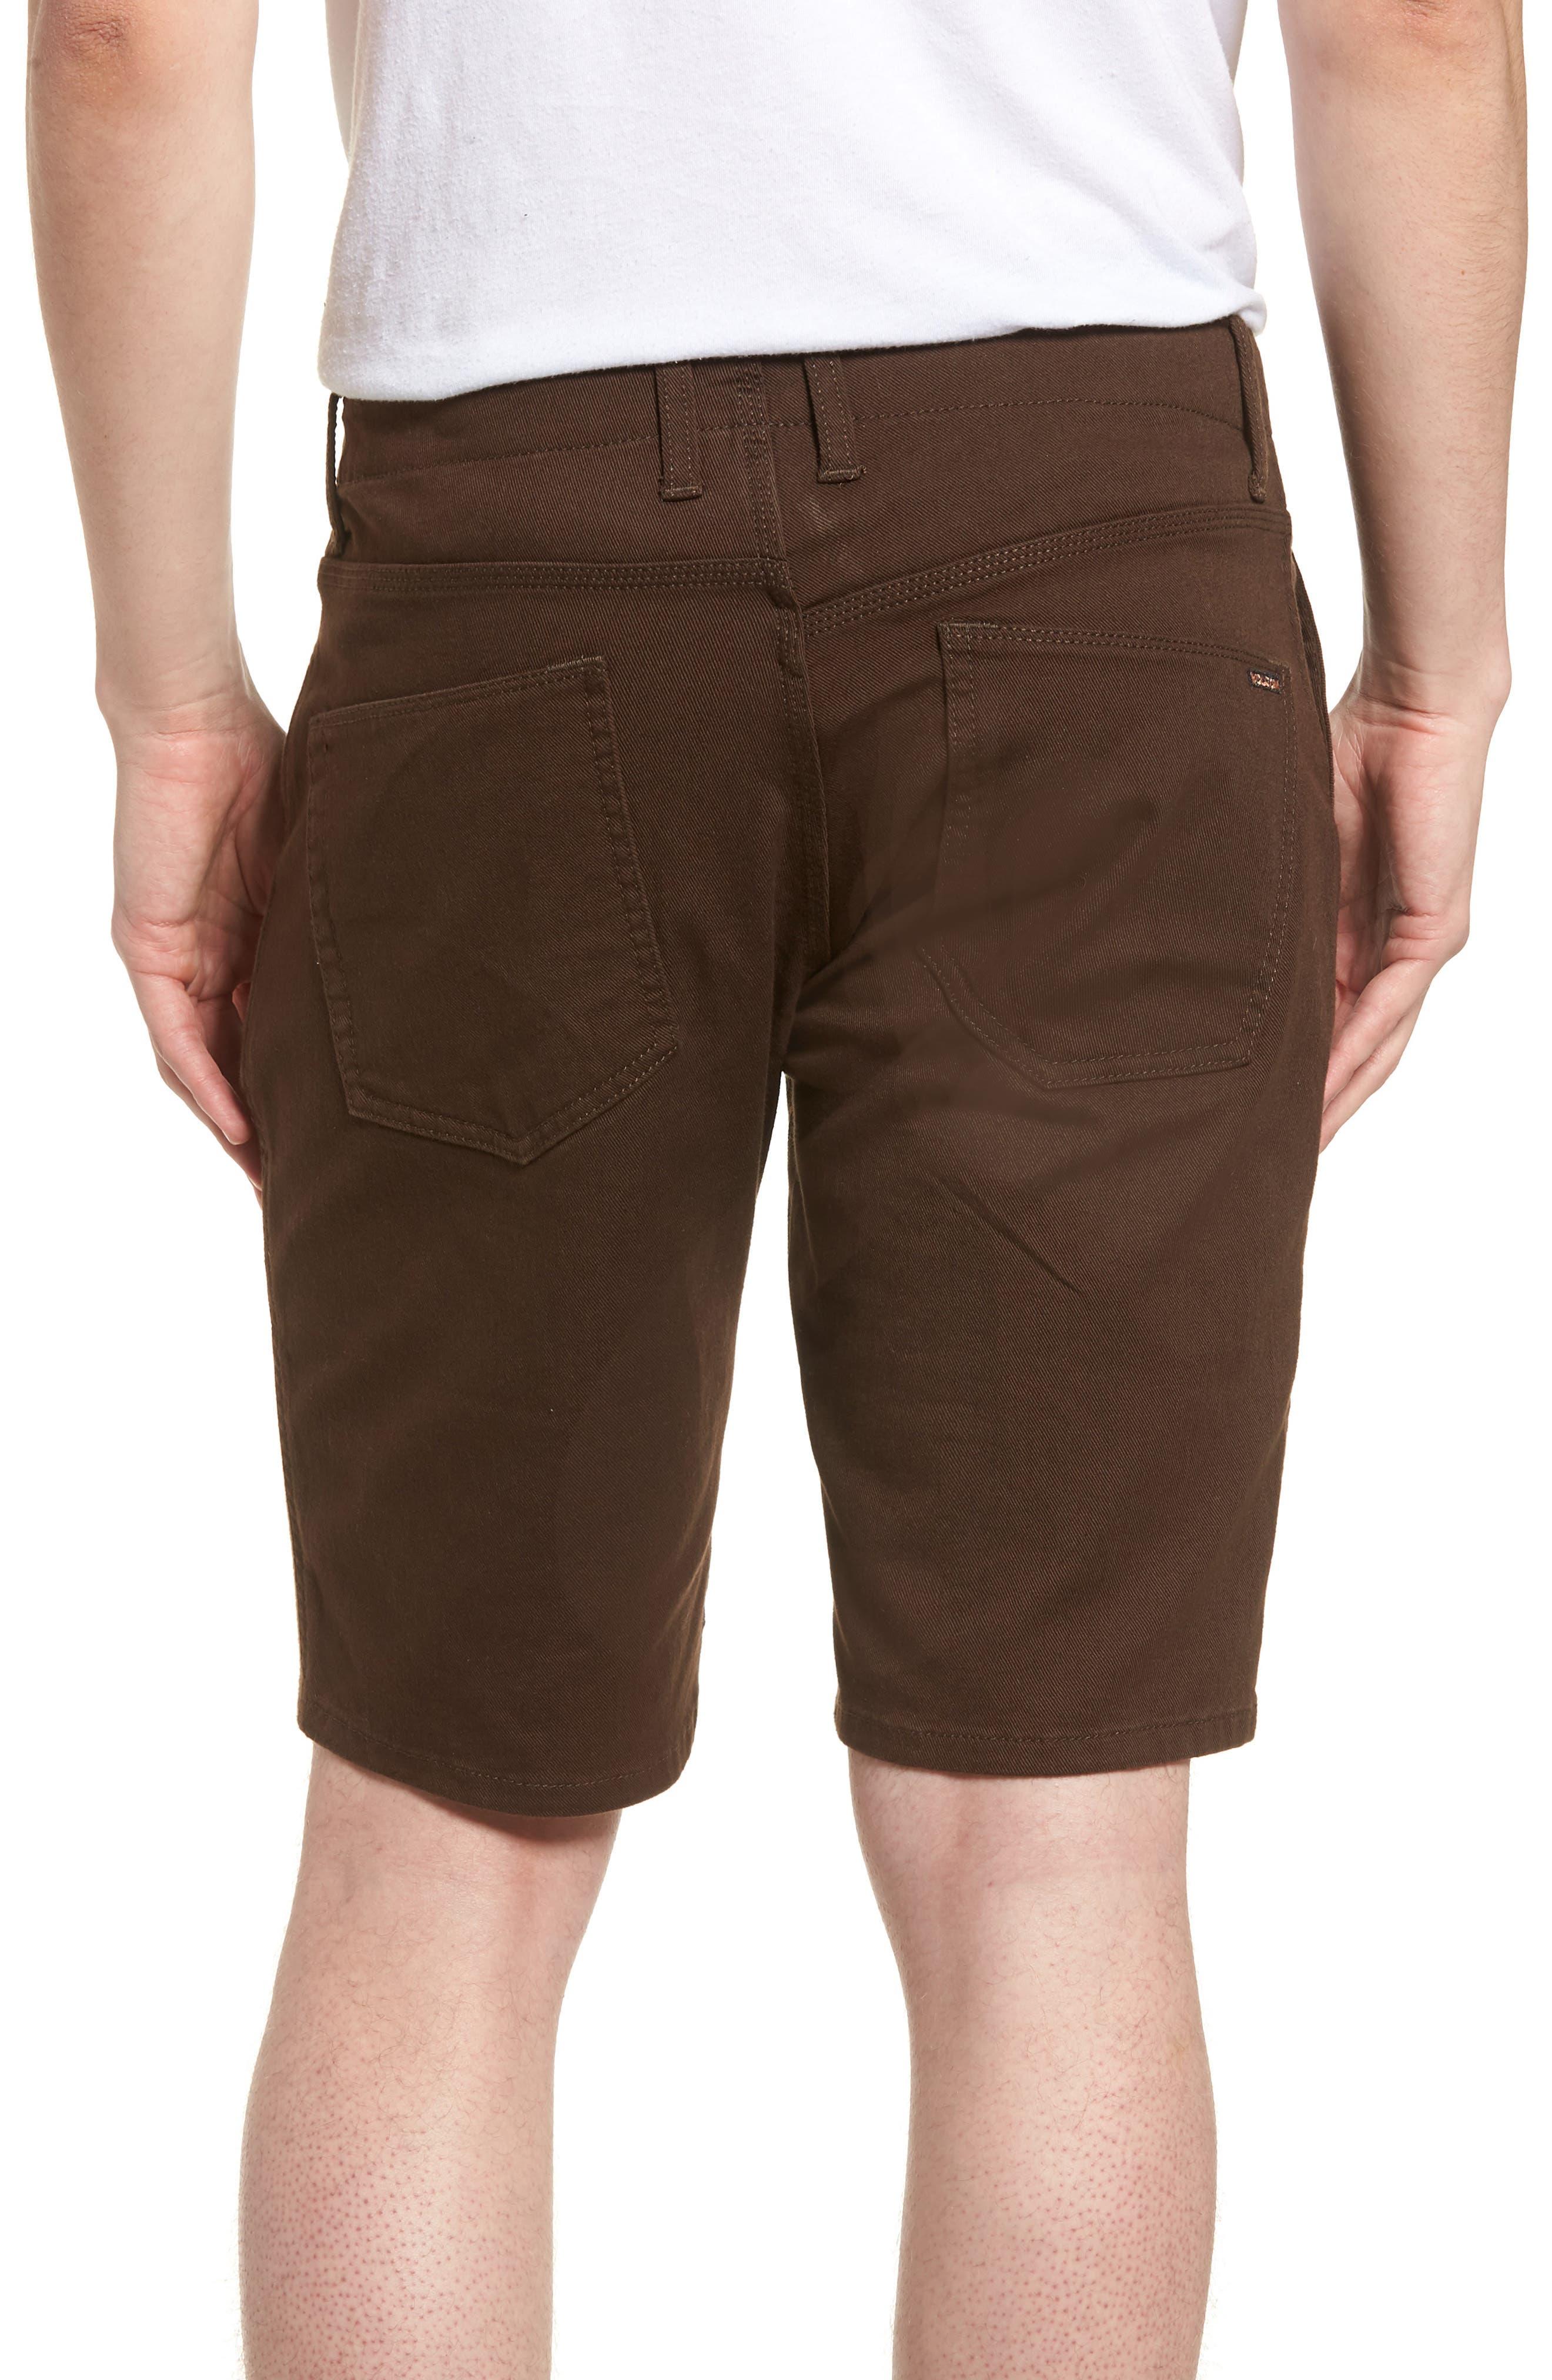 VSM Prowler Shorts,                             Alternate thumbnail 5, color,